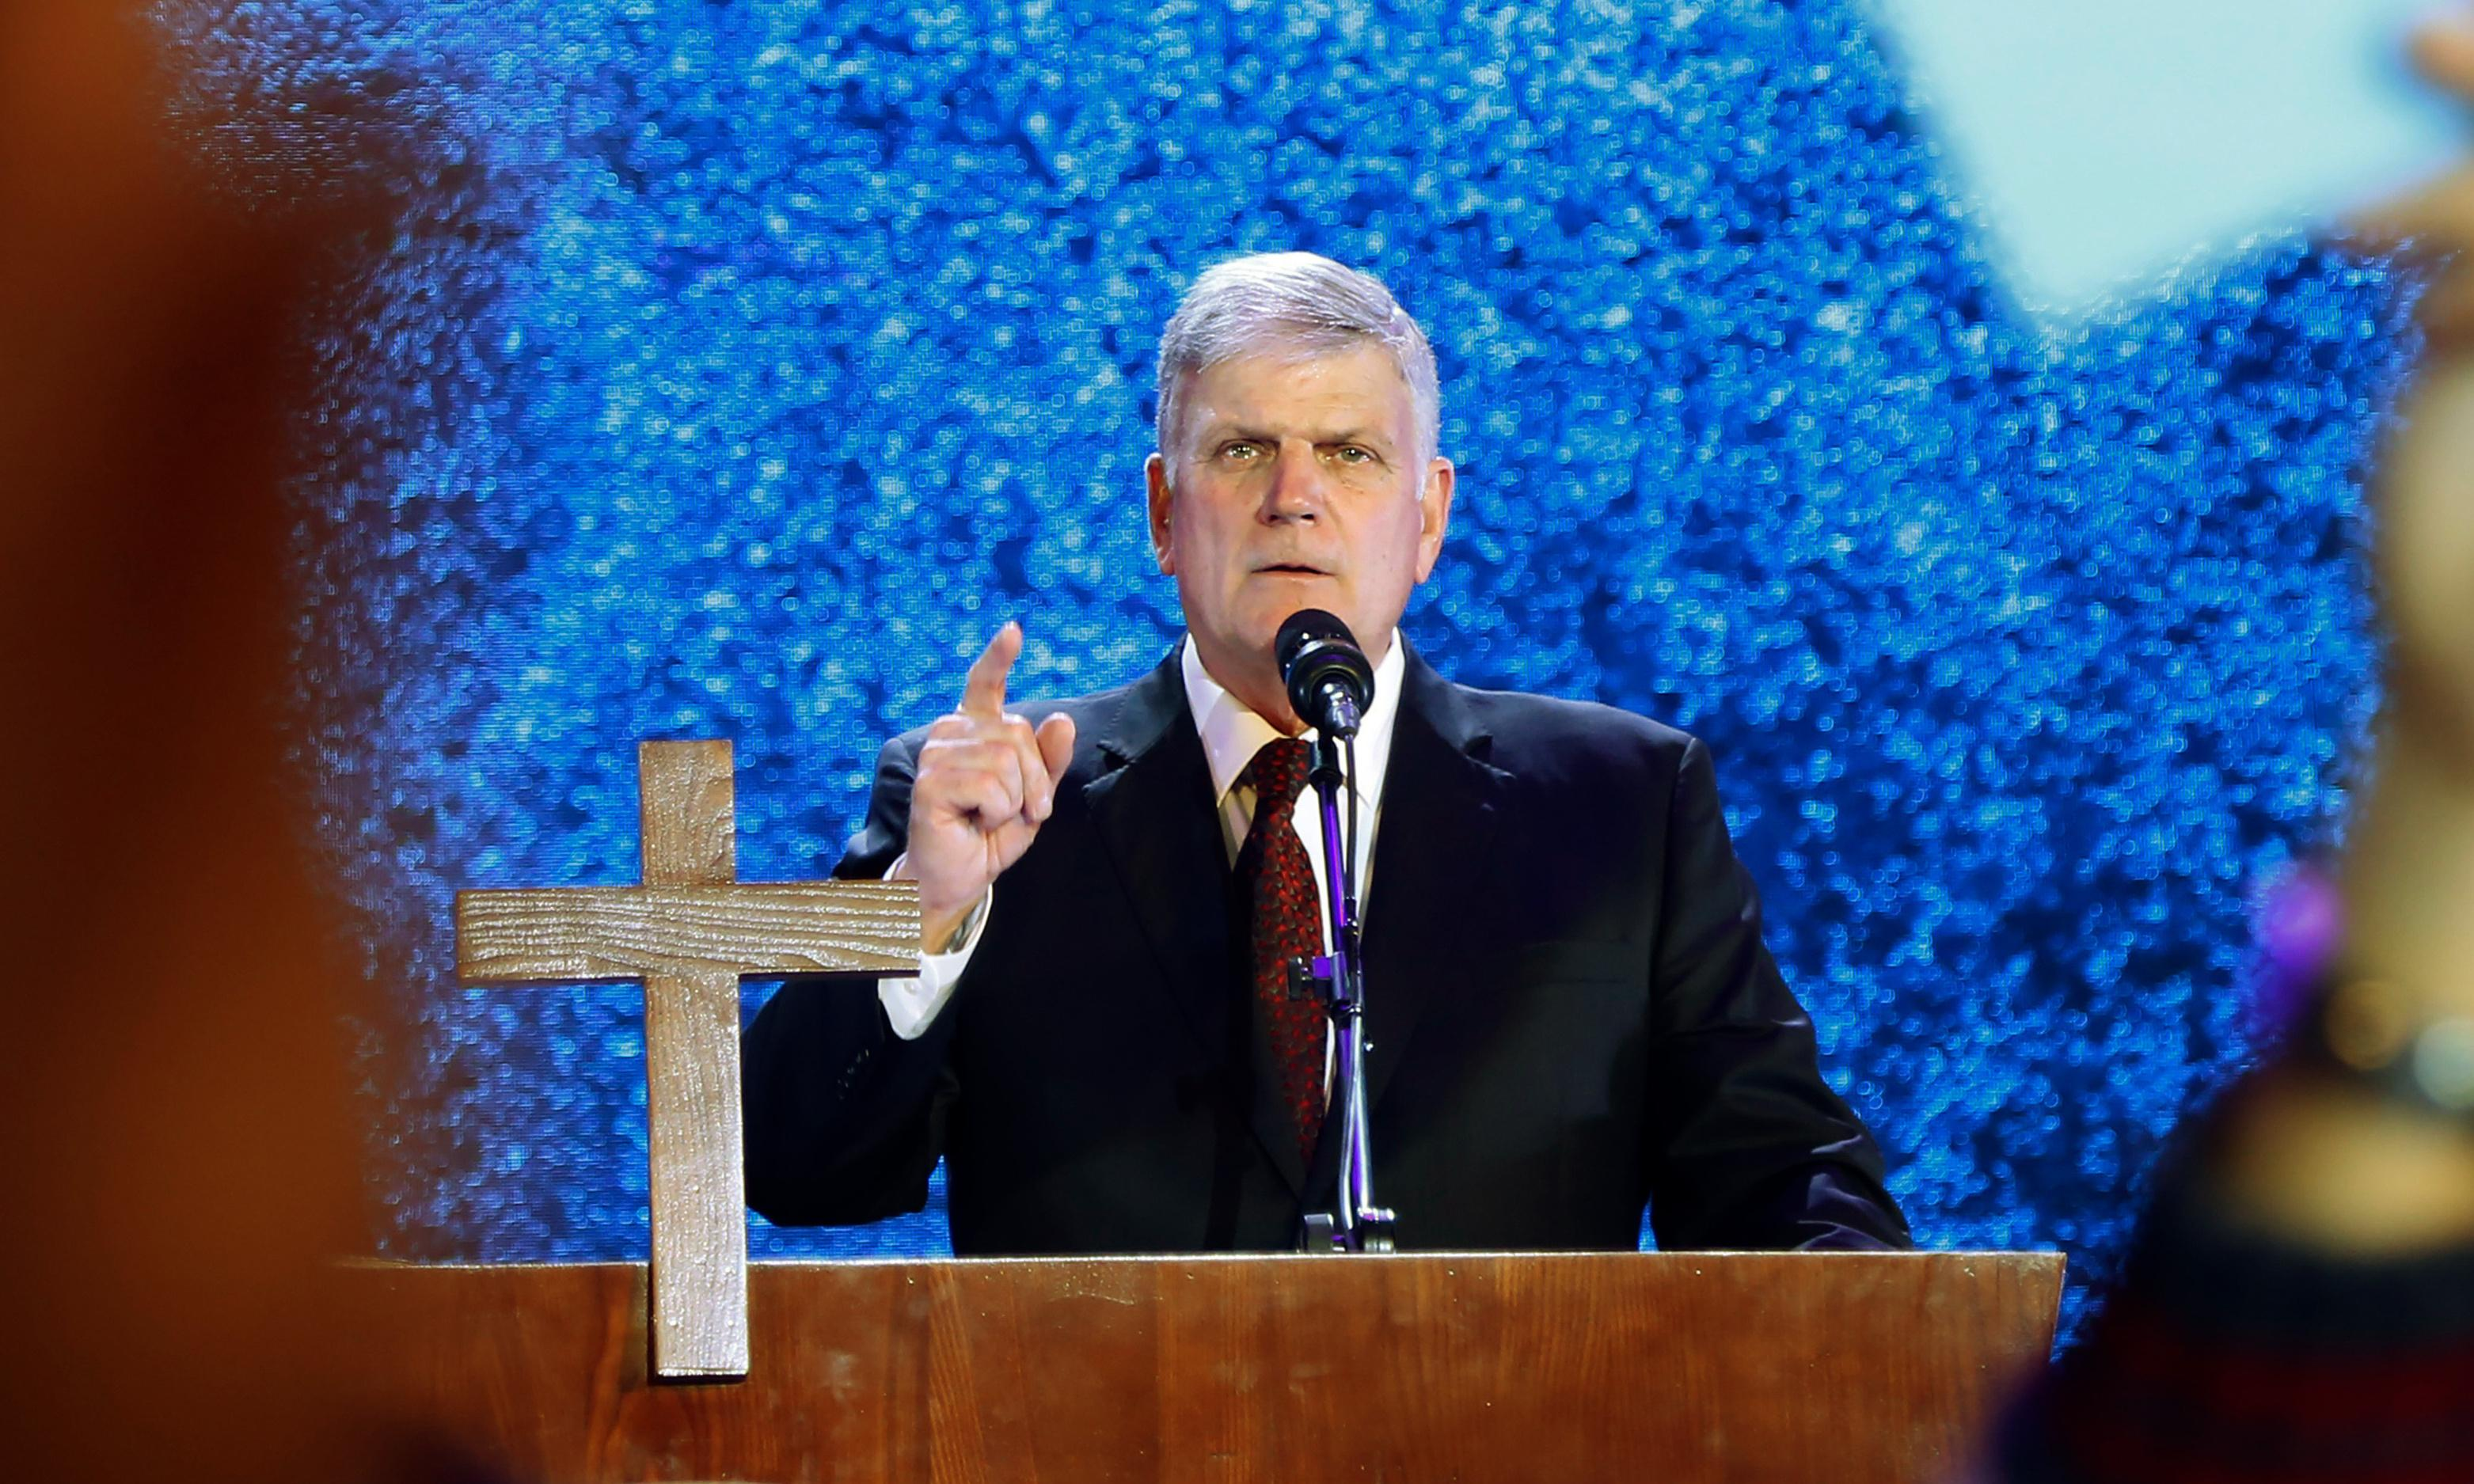 We evangelical Christians won't support Franklin Graham's UK tour